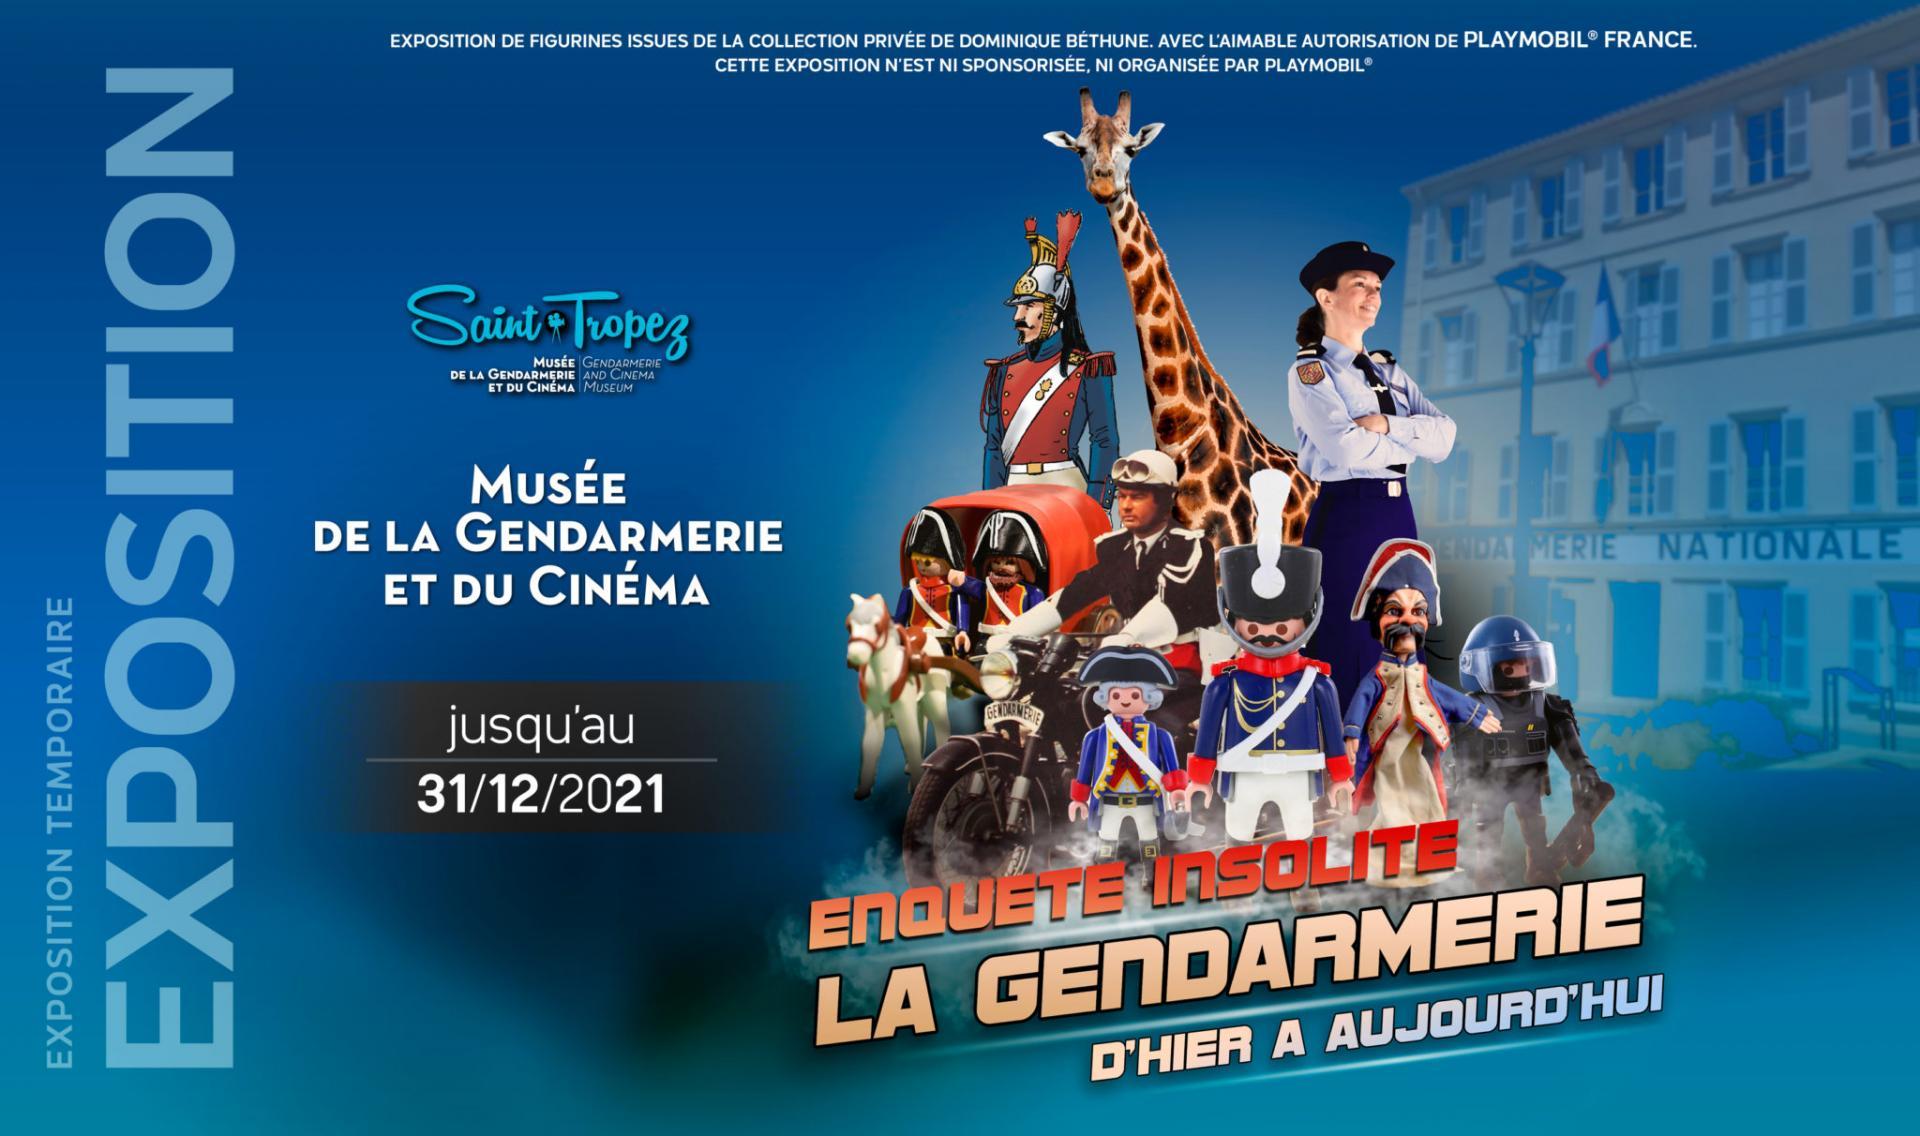 Exposition playmobil gendarmerie saint tropez